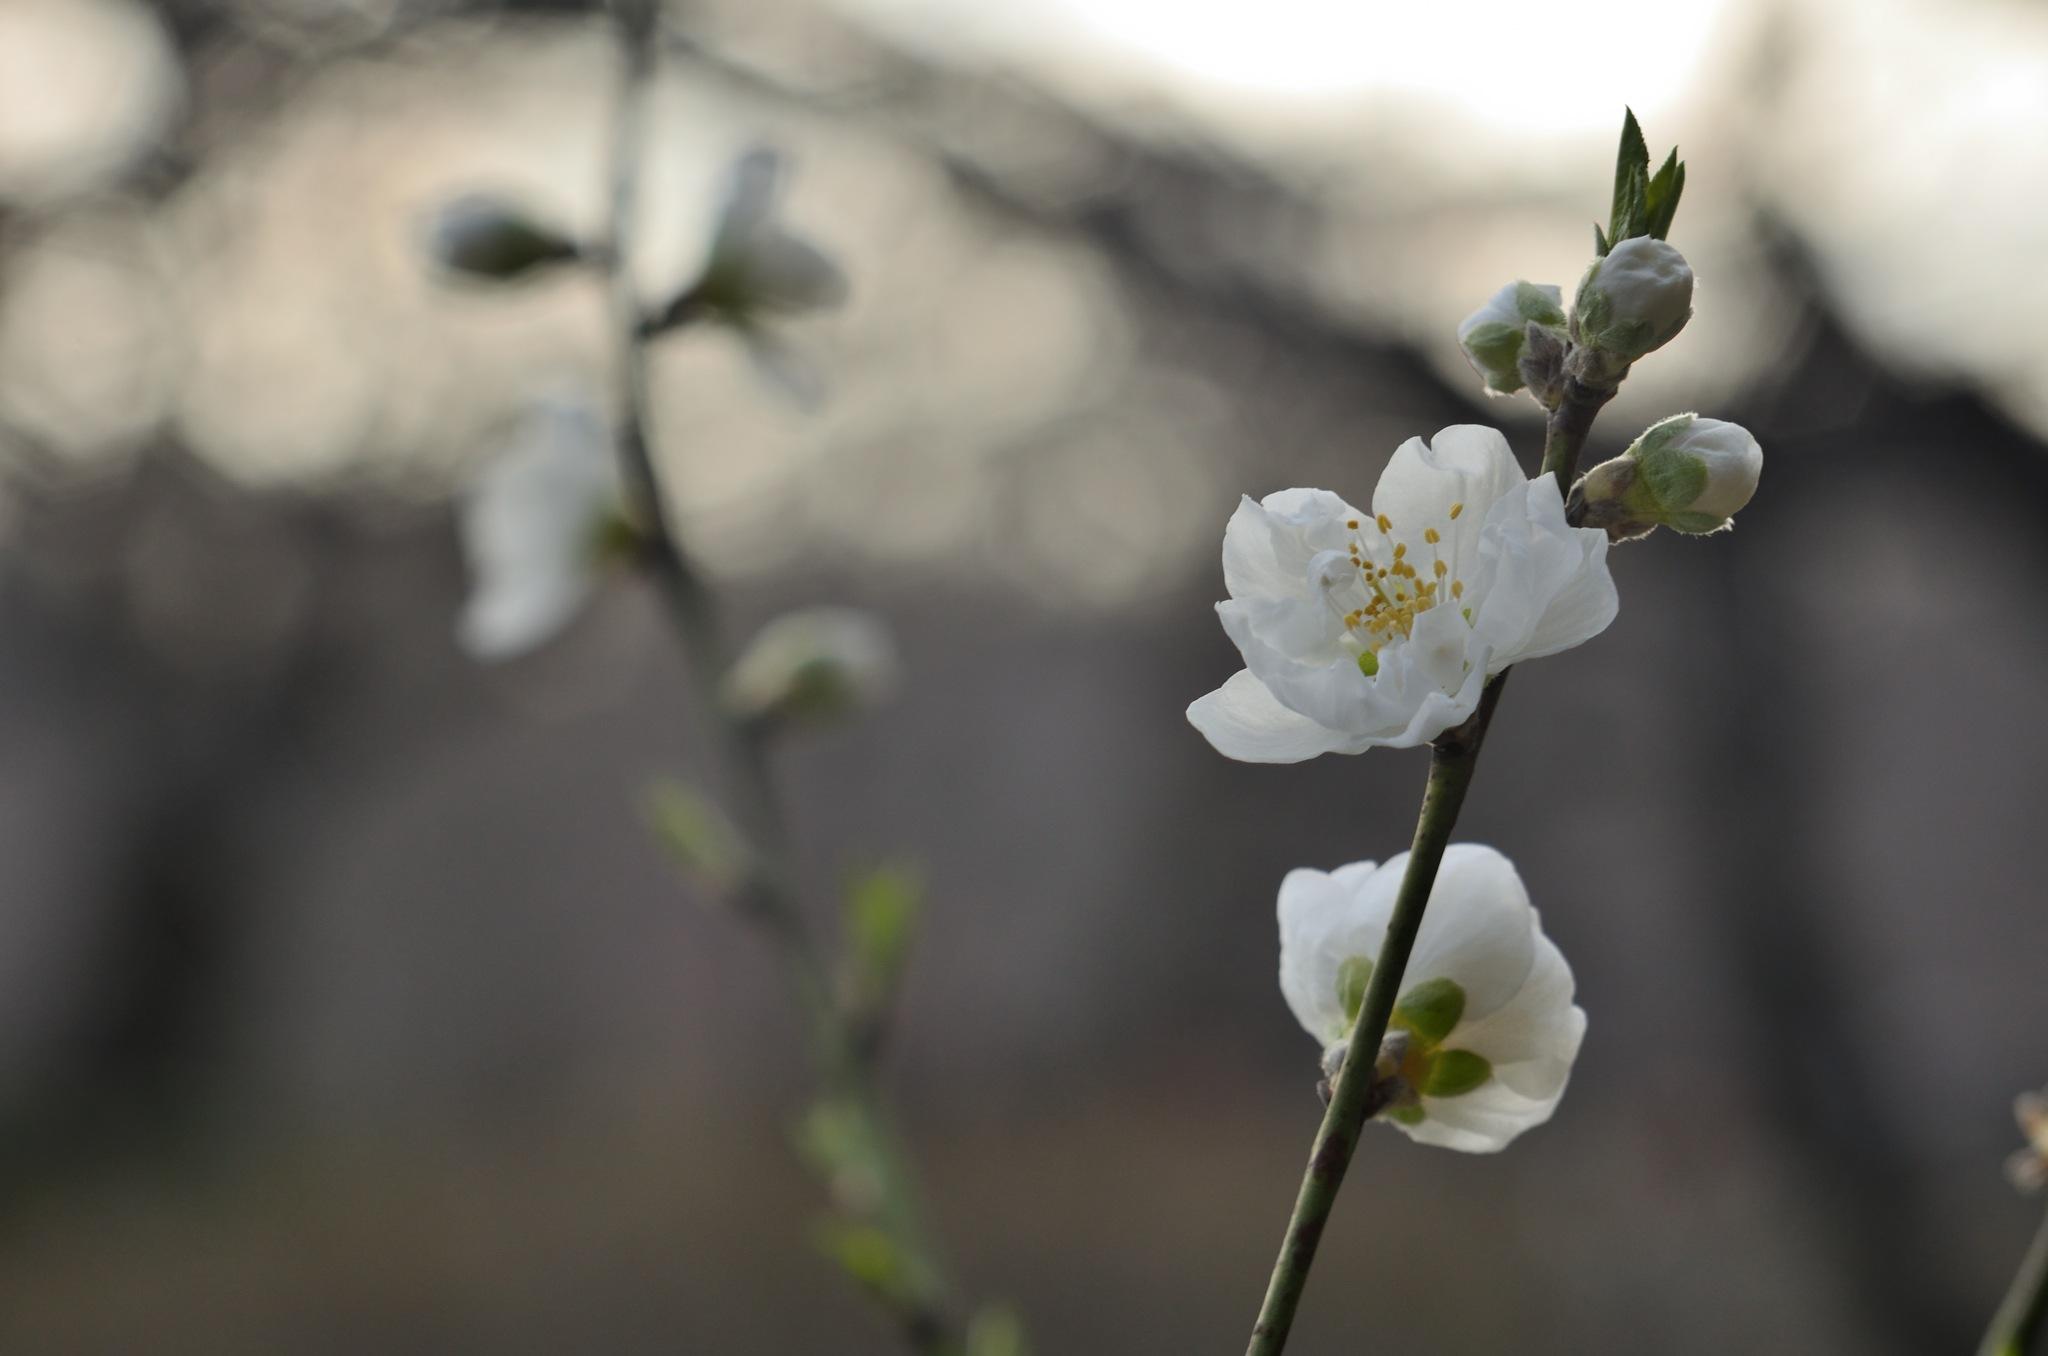 Flowering peach trees by Masahiro  Asano